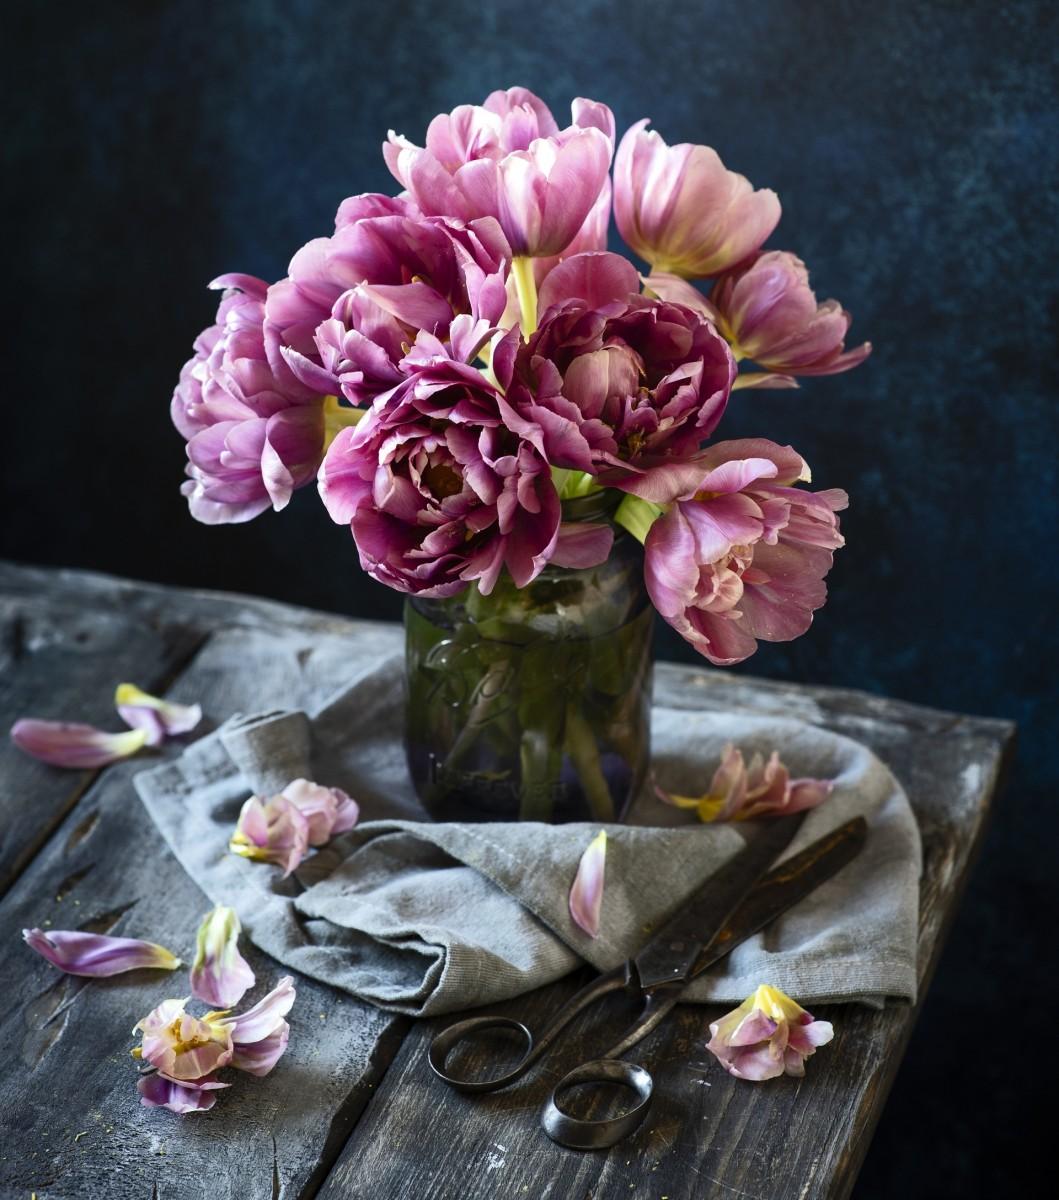 Пазл Собирать пазлы онлайн - Тюльпаны и ножницы